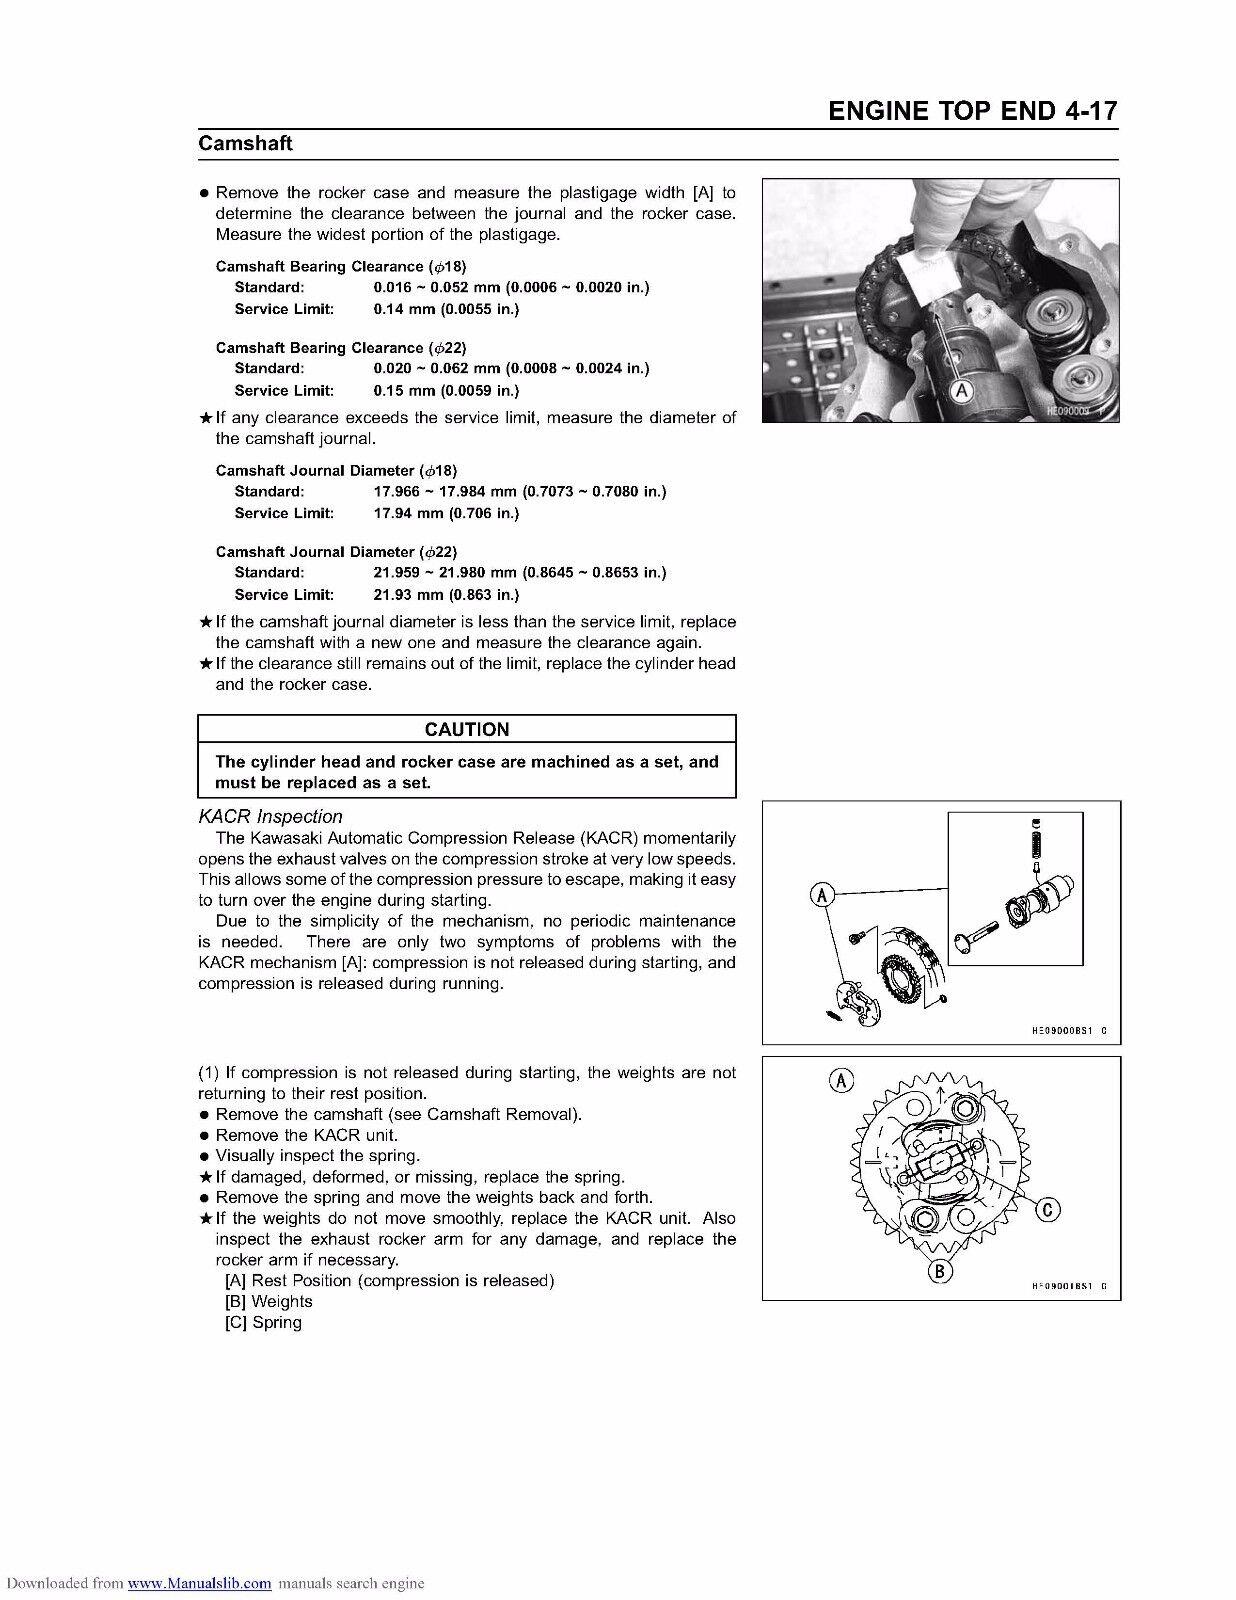 kawasaki prairie 650 service manual repair 20022003 kvf